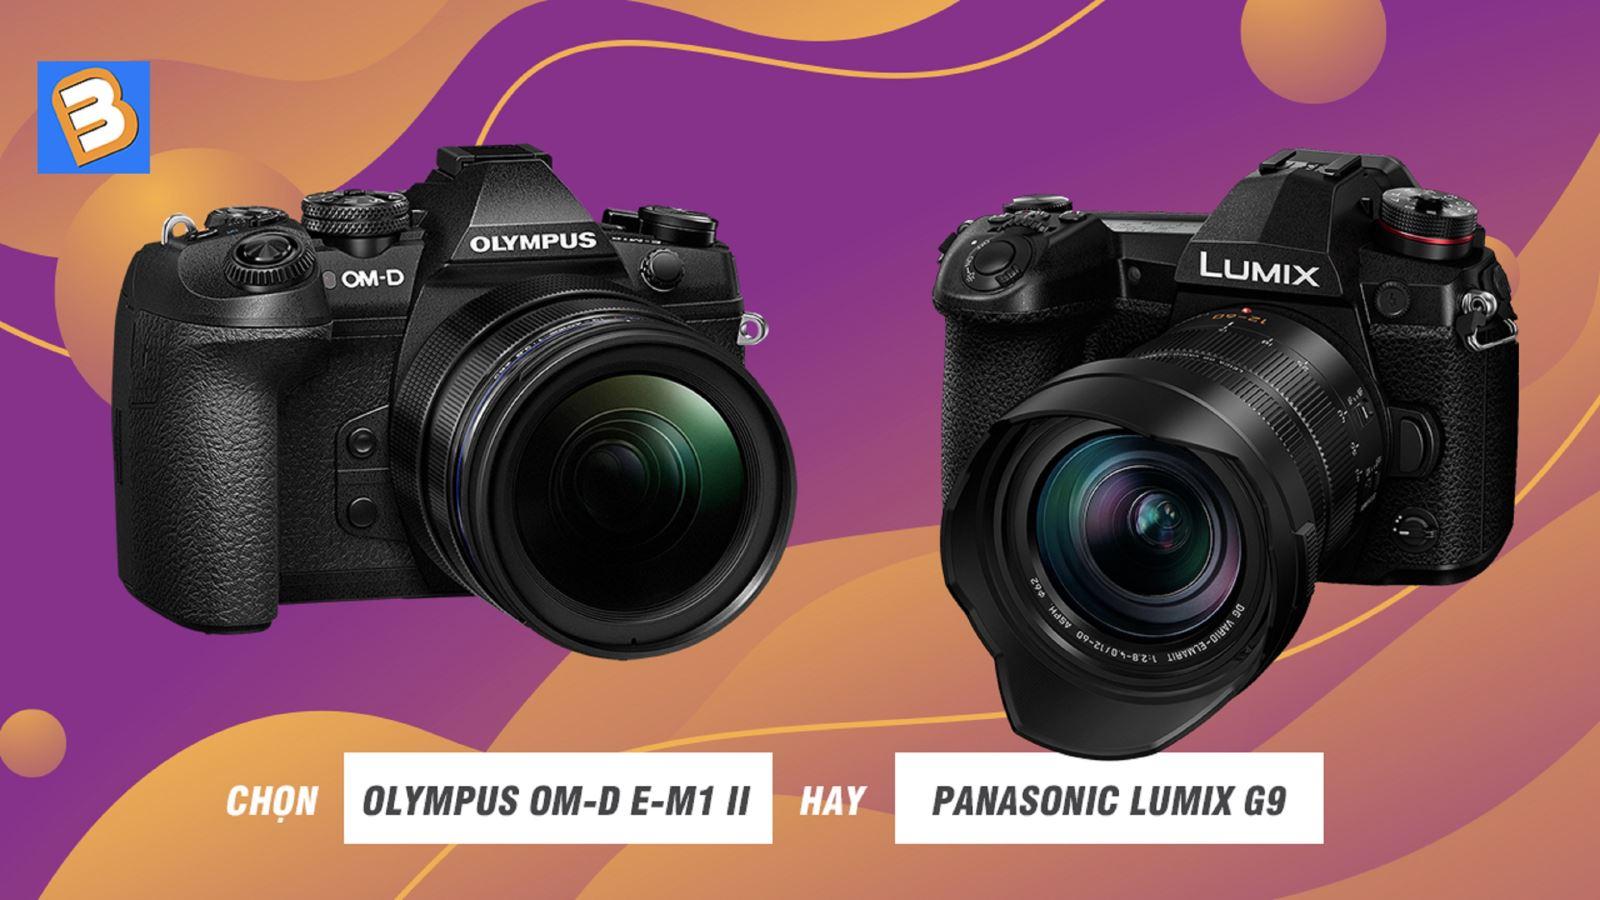 Chọn Olympus OM-D E-M1 II hayPanasonic Lumix G9